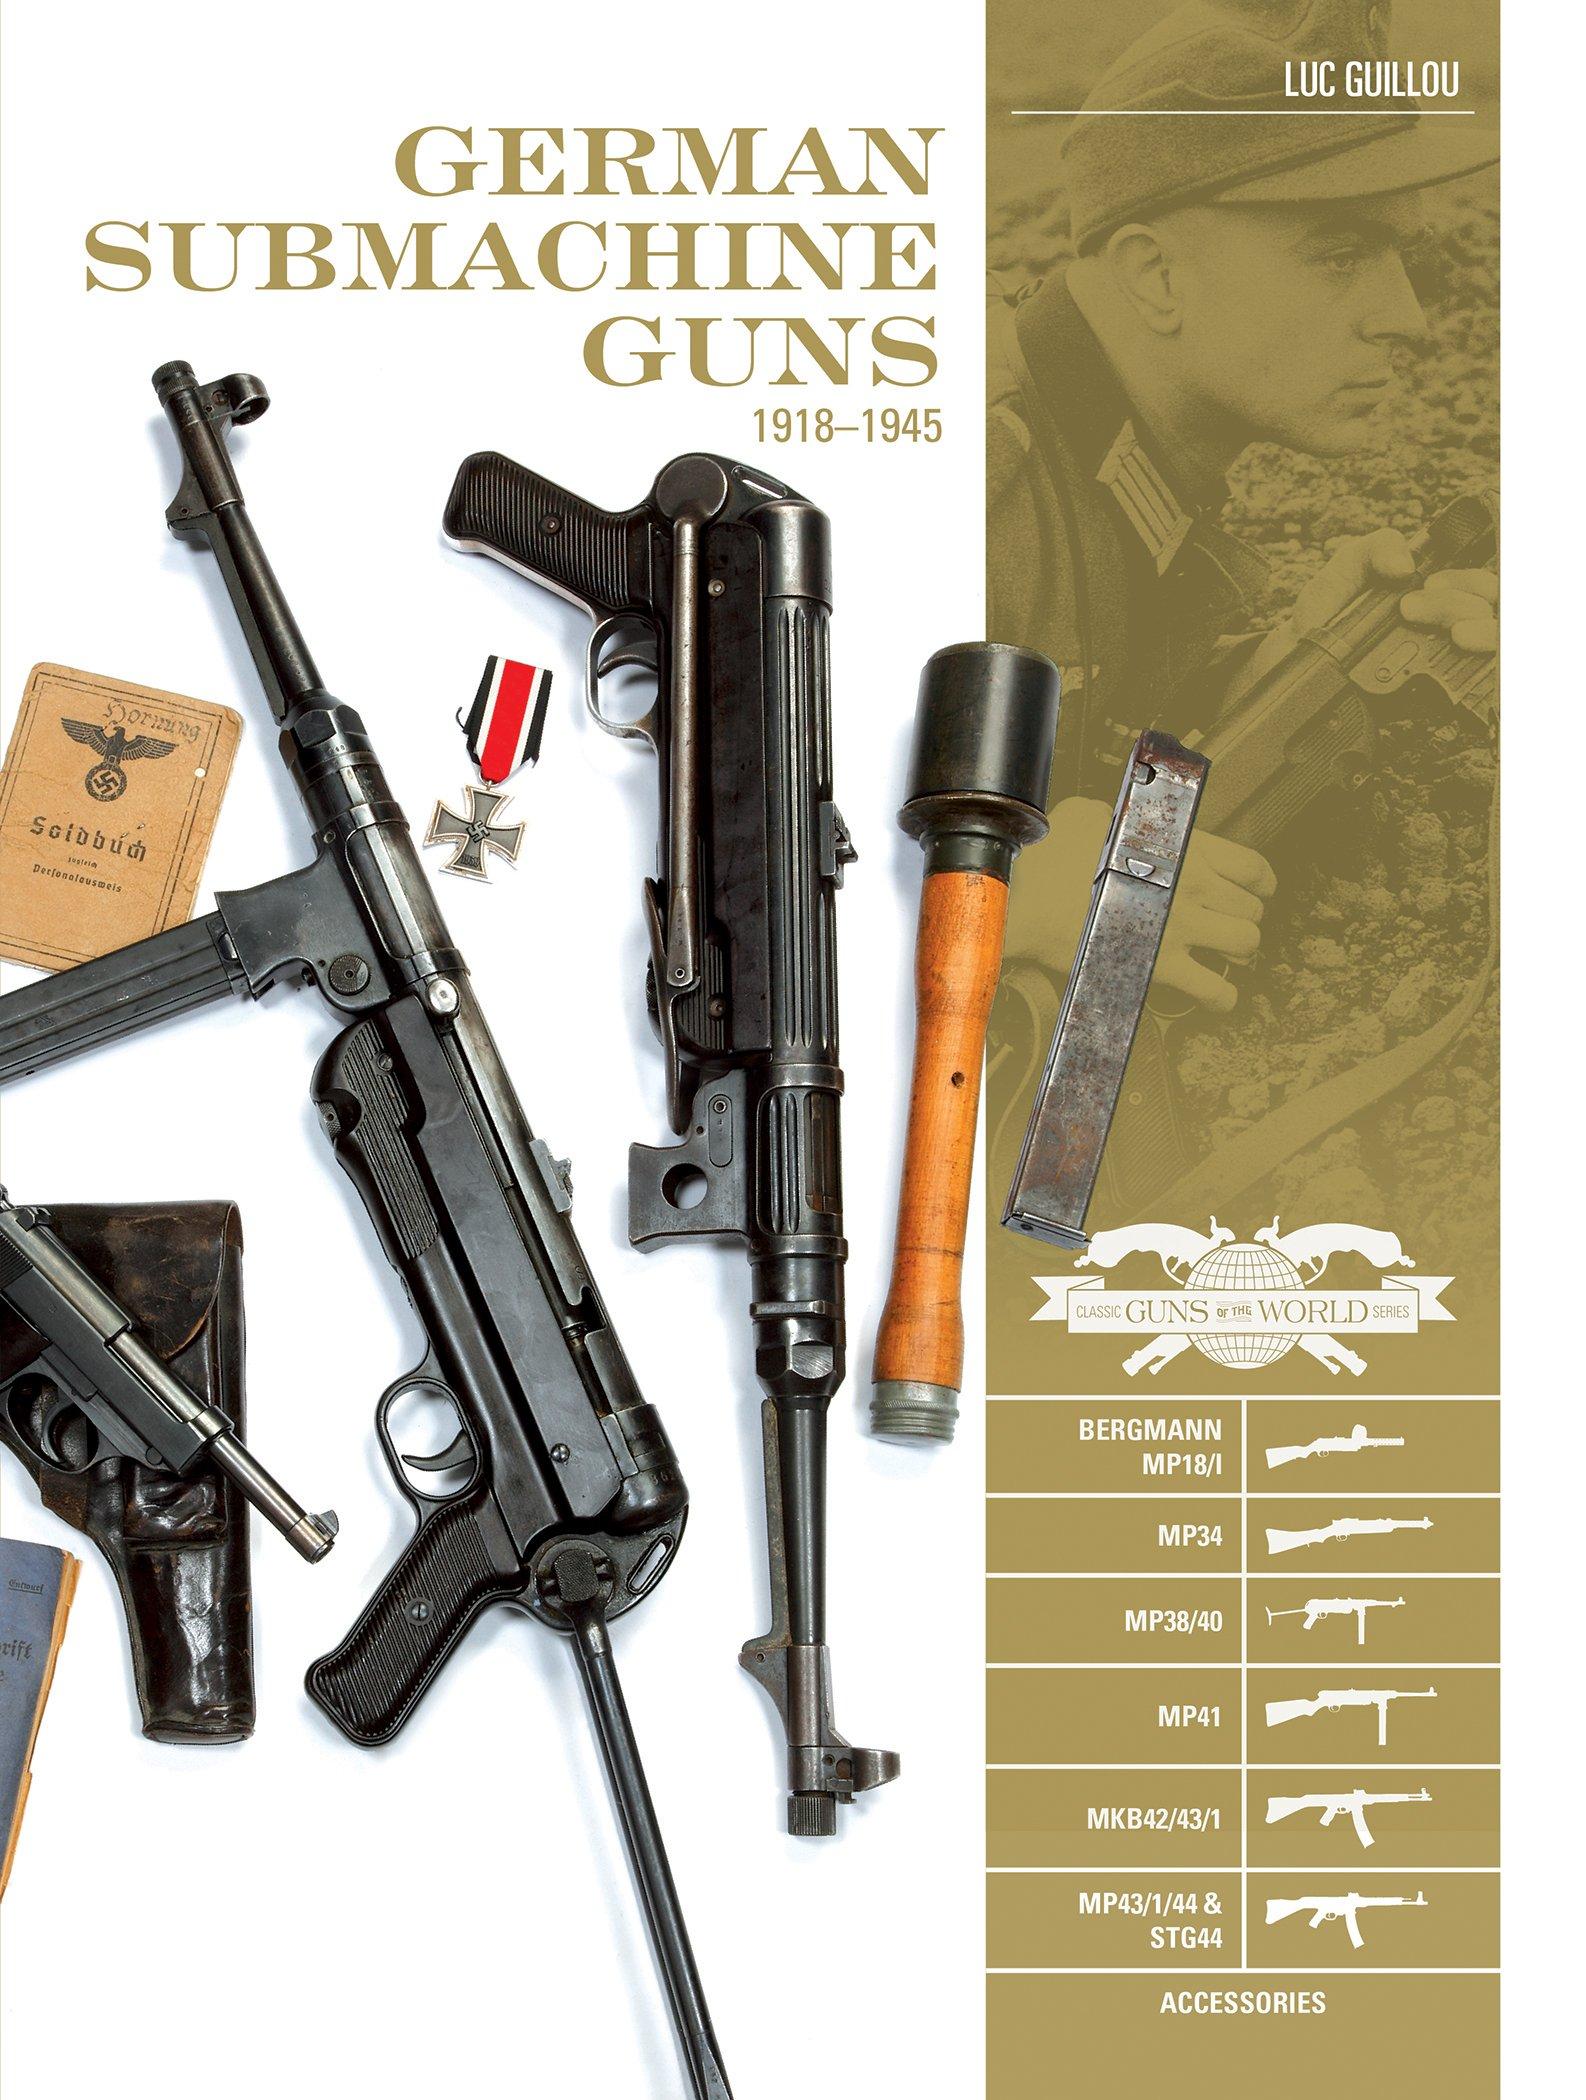 German Submachine Guns, 1918-1945: Bergmann MP18/I, MP34/38/40/41